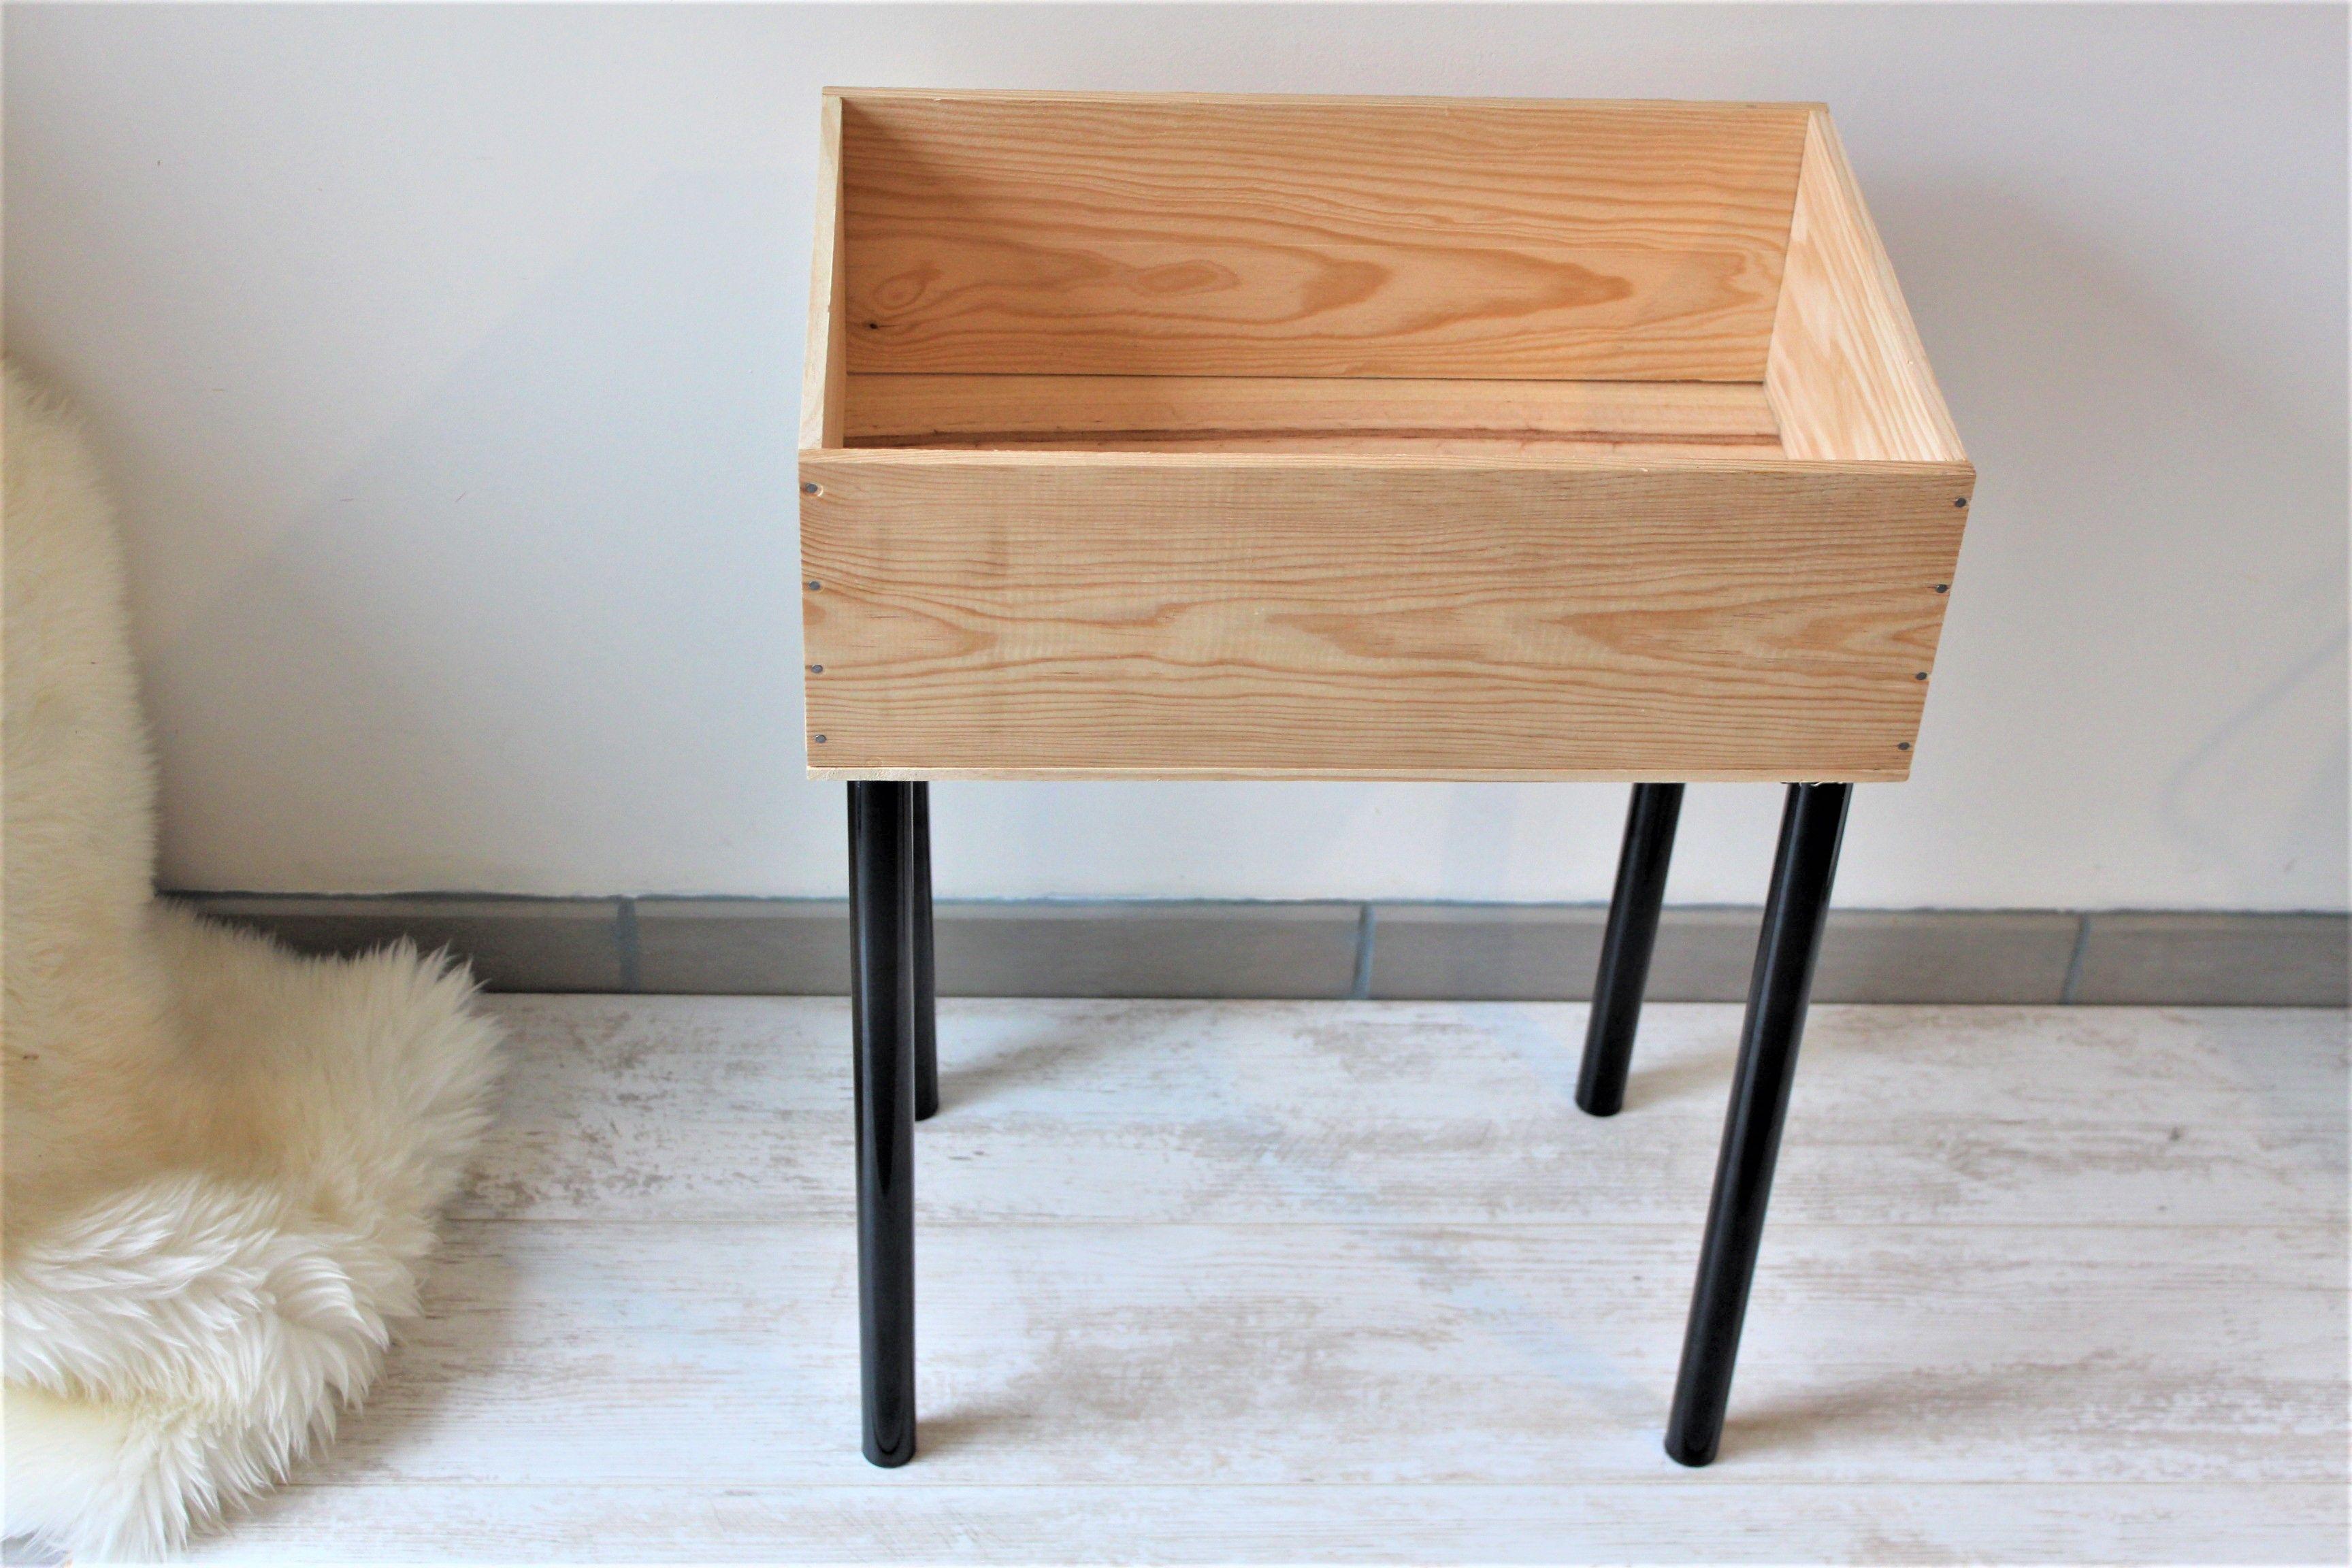 Diy meuble furniture rangement caisse bois vin wine box wood upcycle